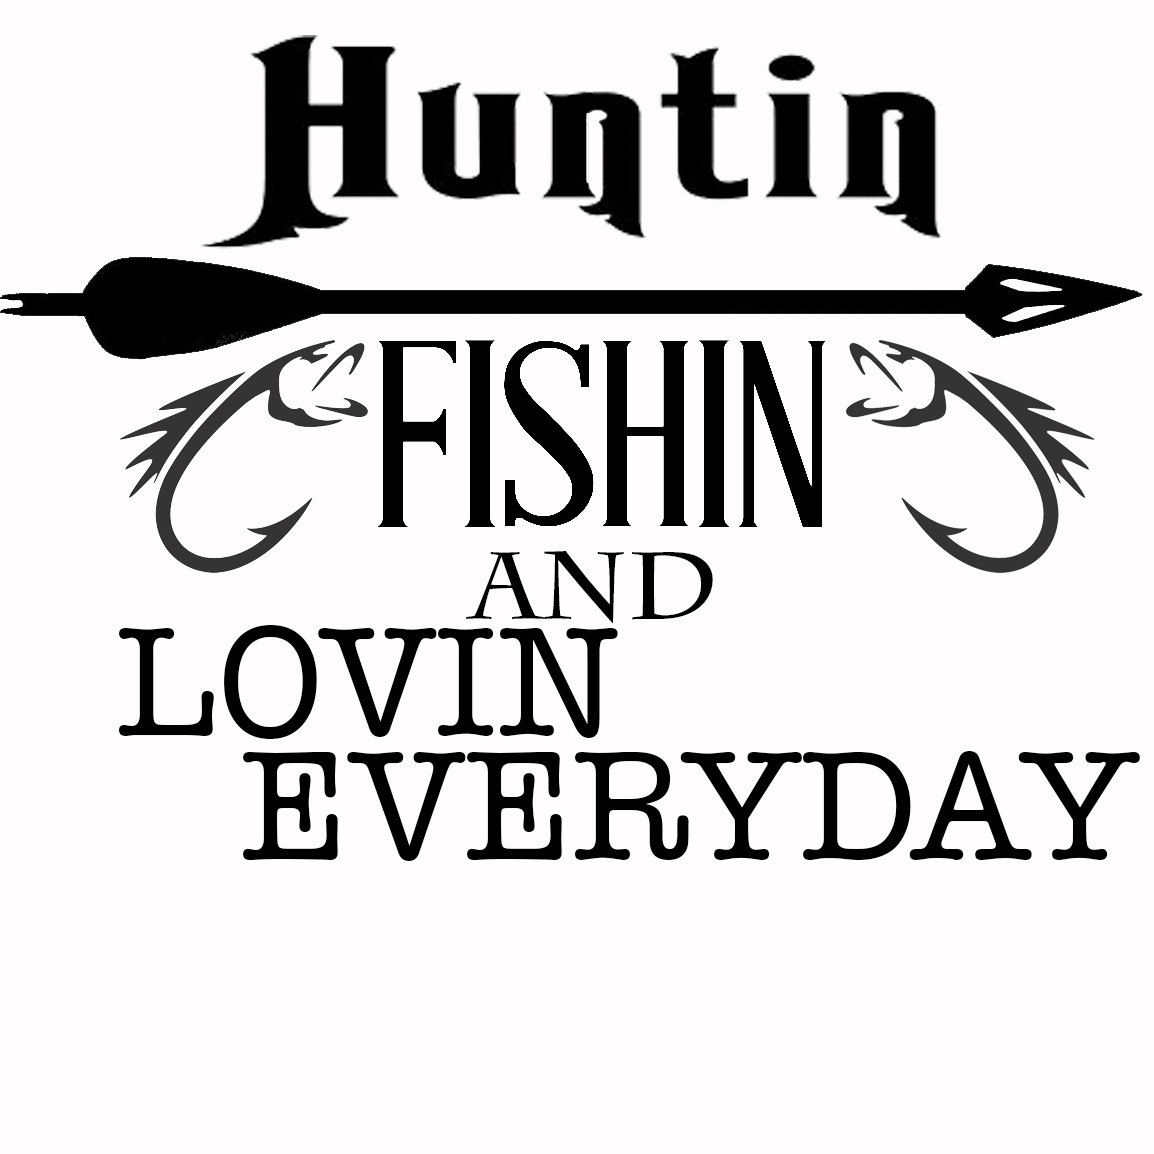 Hunting fishing and loving everyday luke bryan decal ...